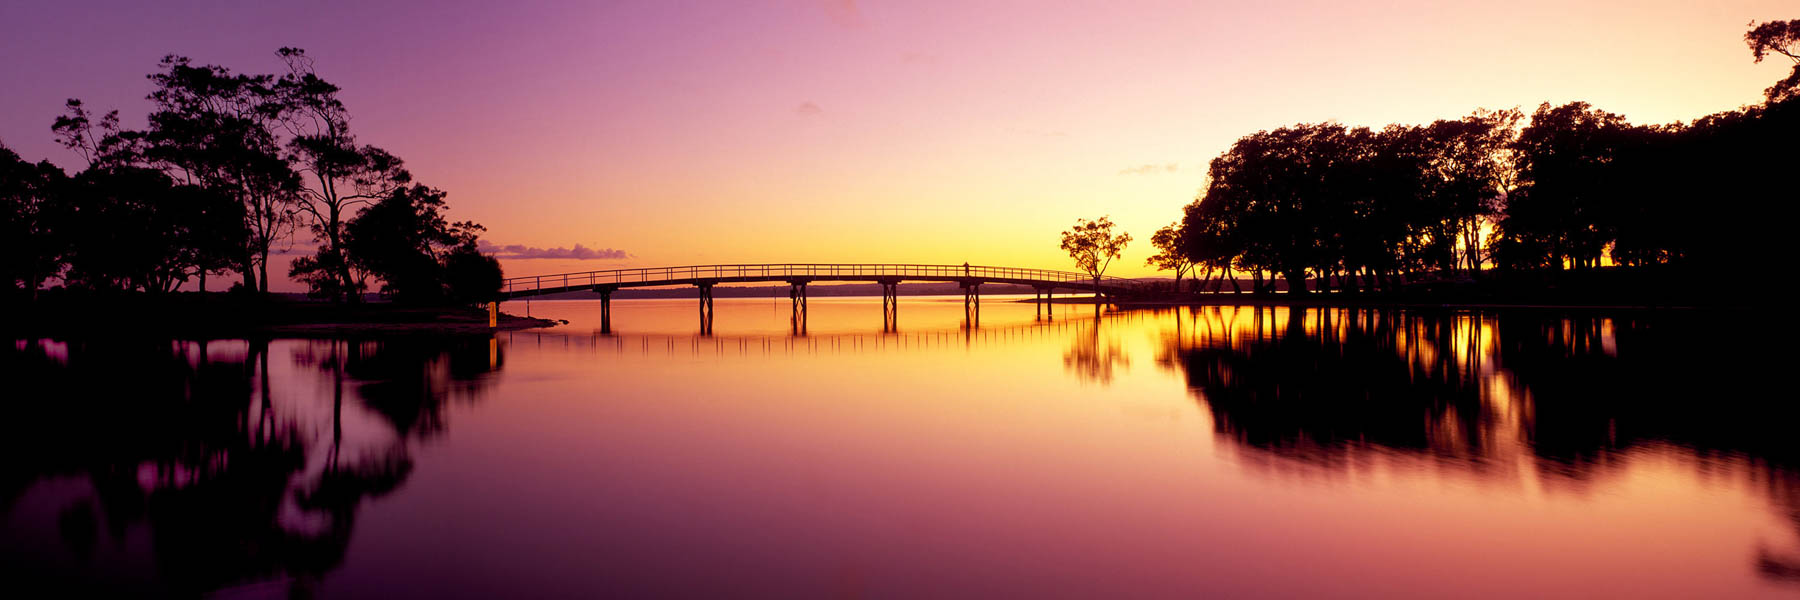 Perfect sunrise reflections at Budgewoi, Tuggerah Lakes, Central Coast, NSW, Australia.